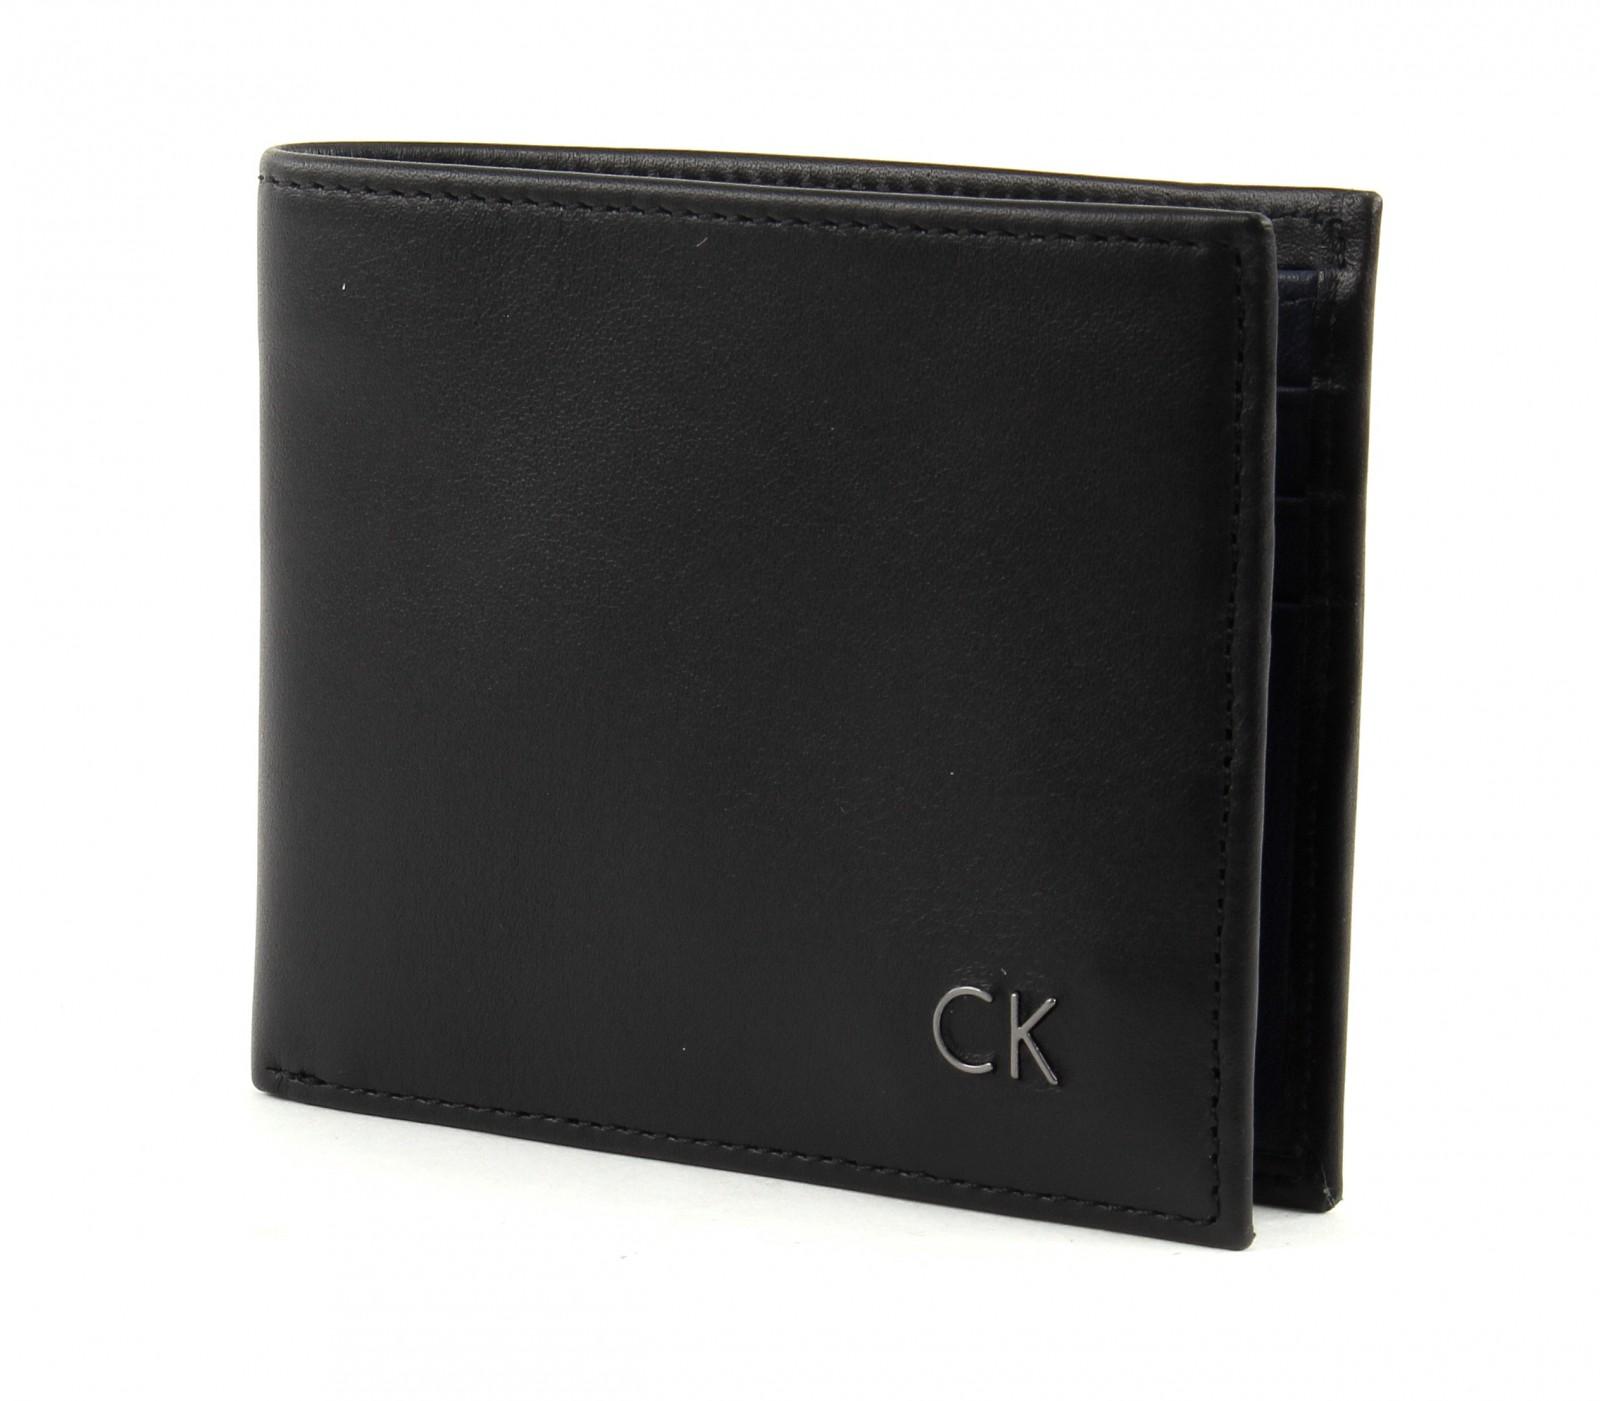 calvin klein l3on slimfold 6 cc geldbeutel portemonnaie. Black Bedroom Furniture Sets. Home Design Ideas